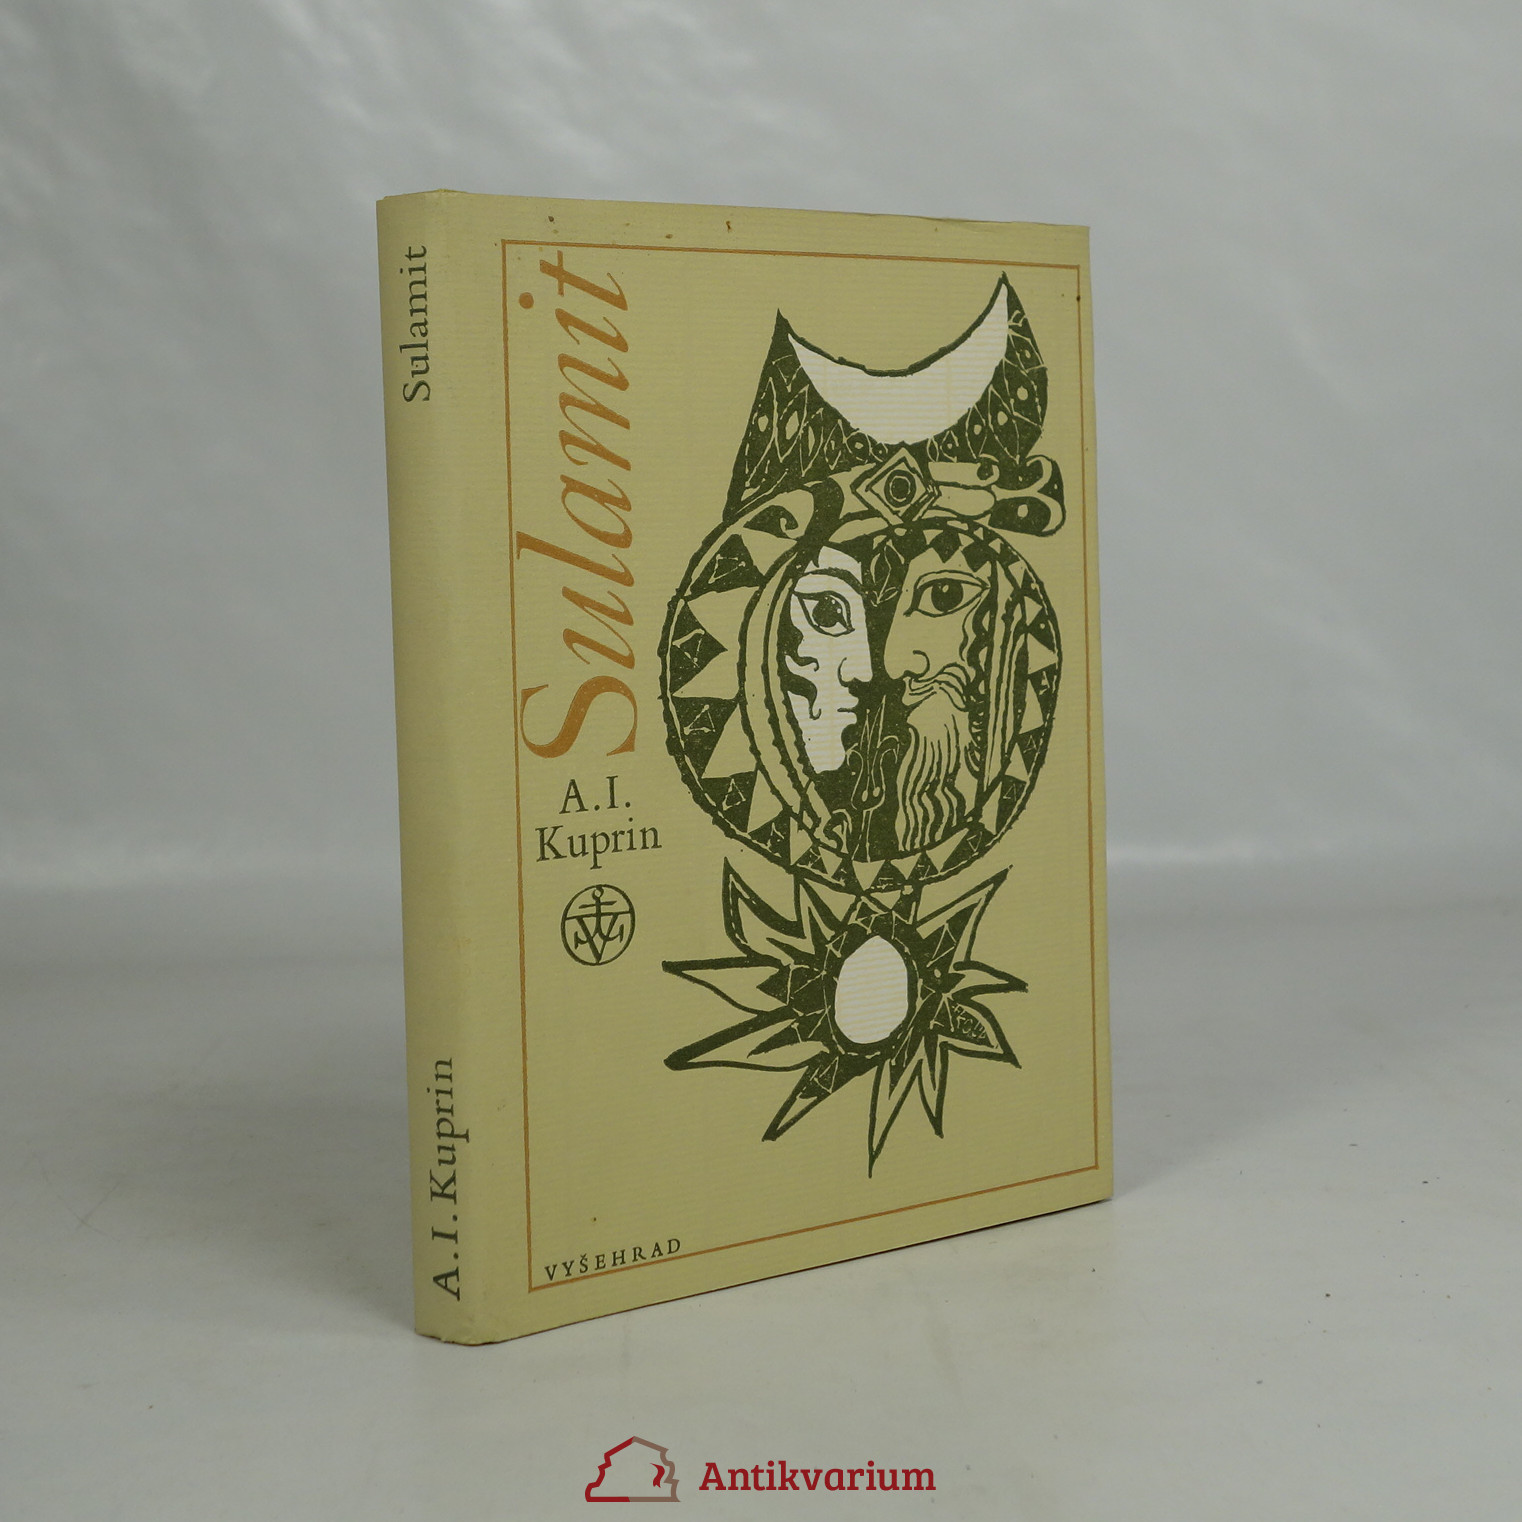 antikvární kniha Sulamit, 1979